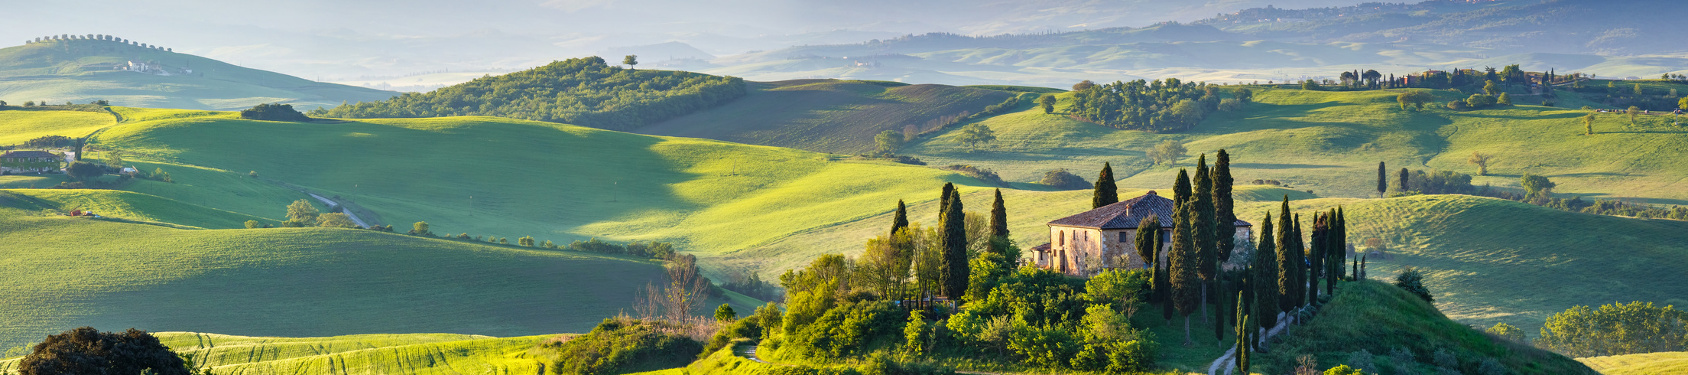 Bild von Toskana